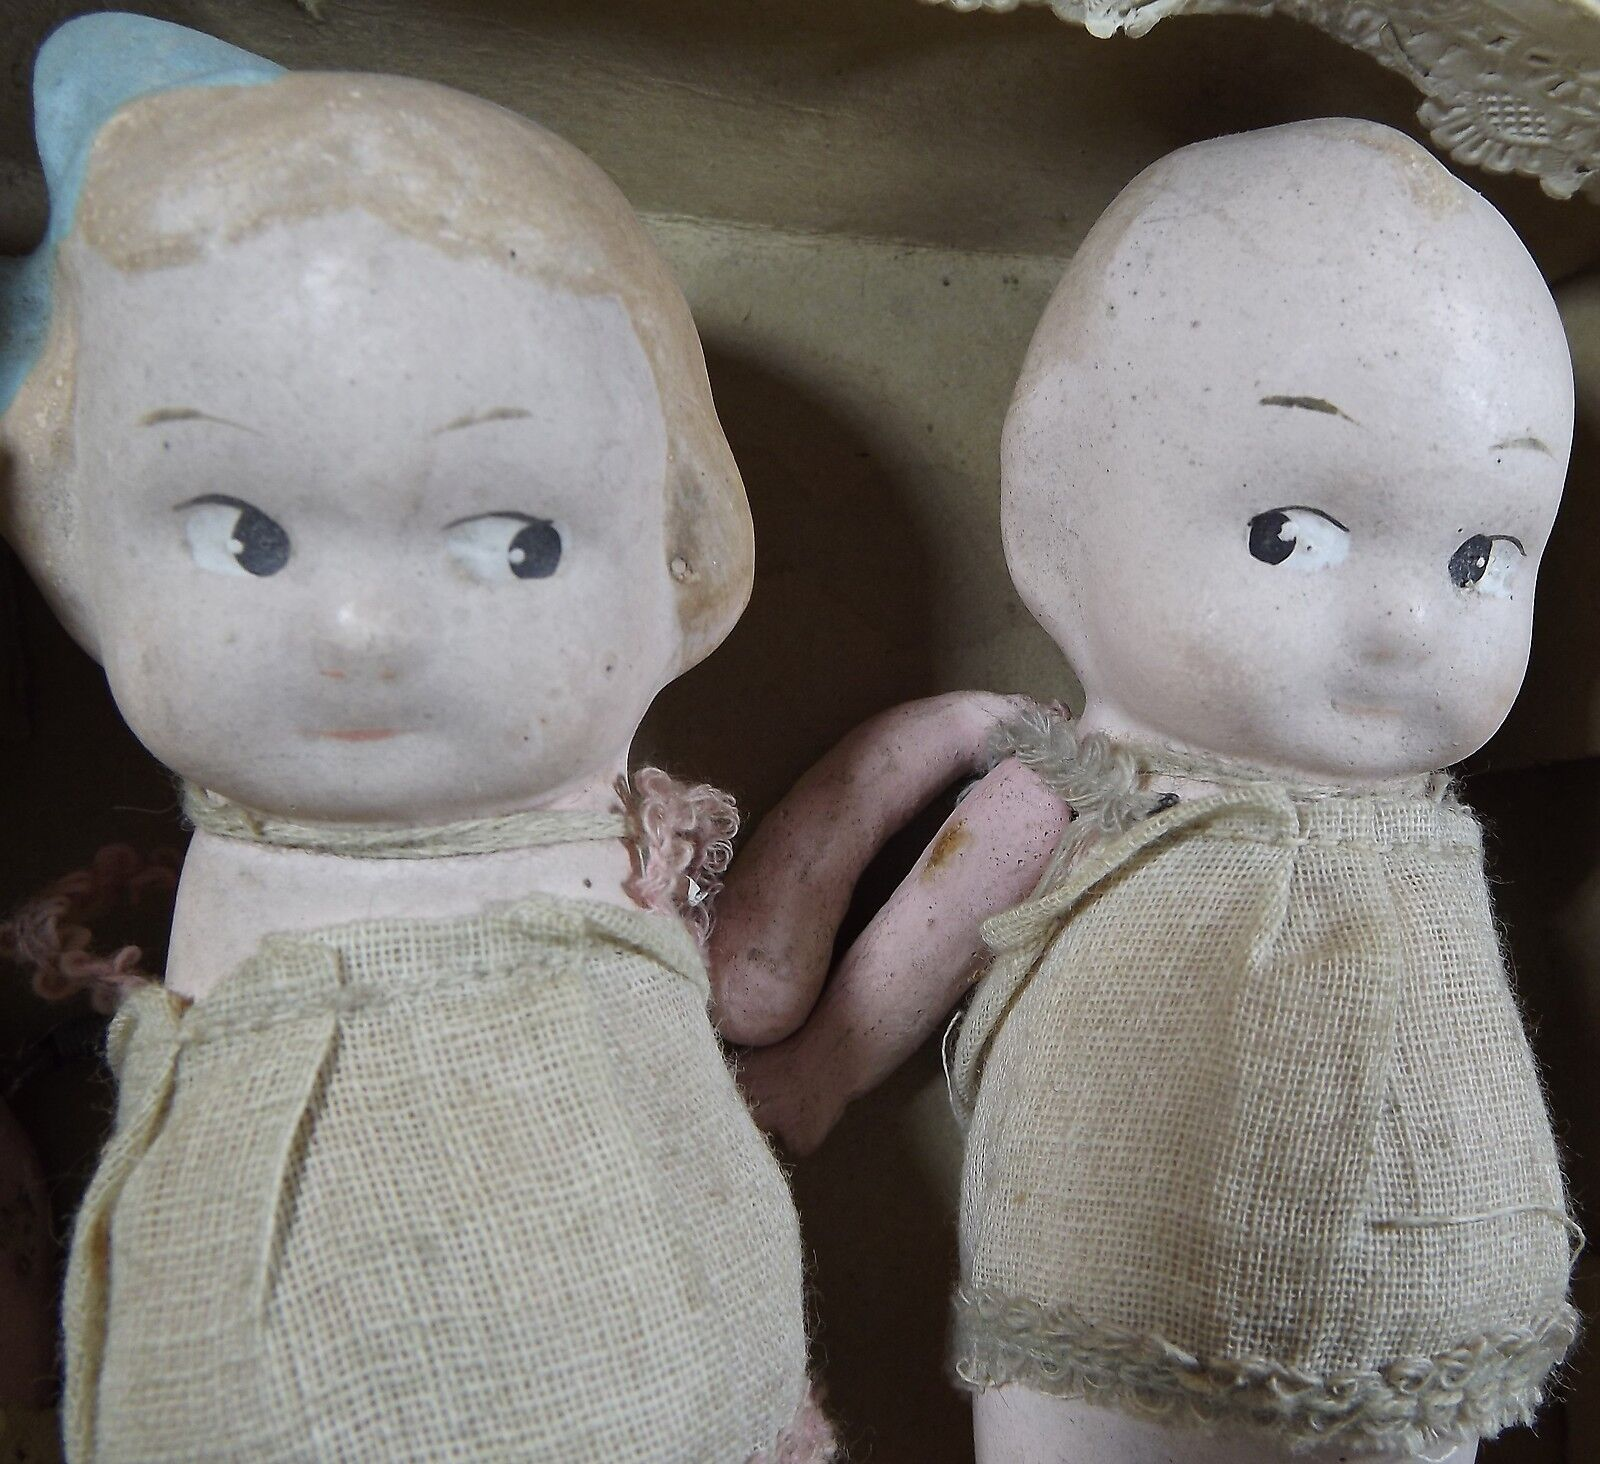 Pair Pair Pair of Boxed Vintage 12cm Kewpie-Style Composition Dolls Probably Japanese befc17